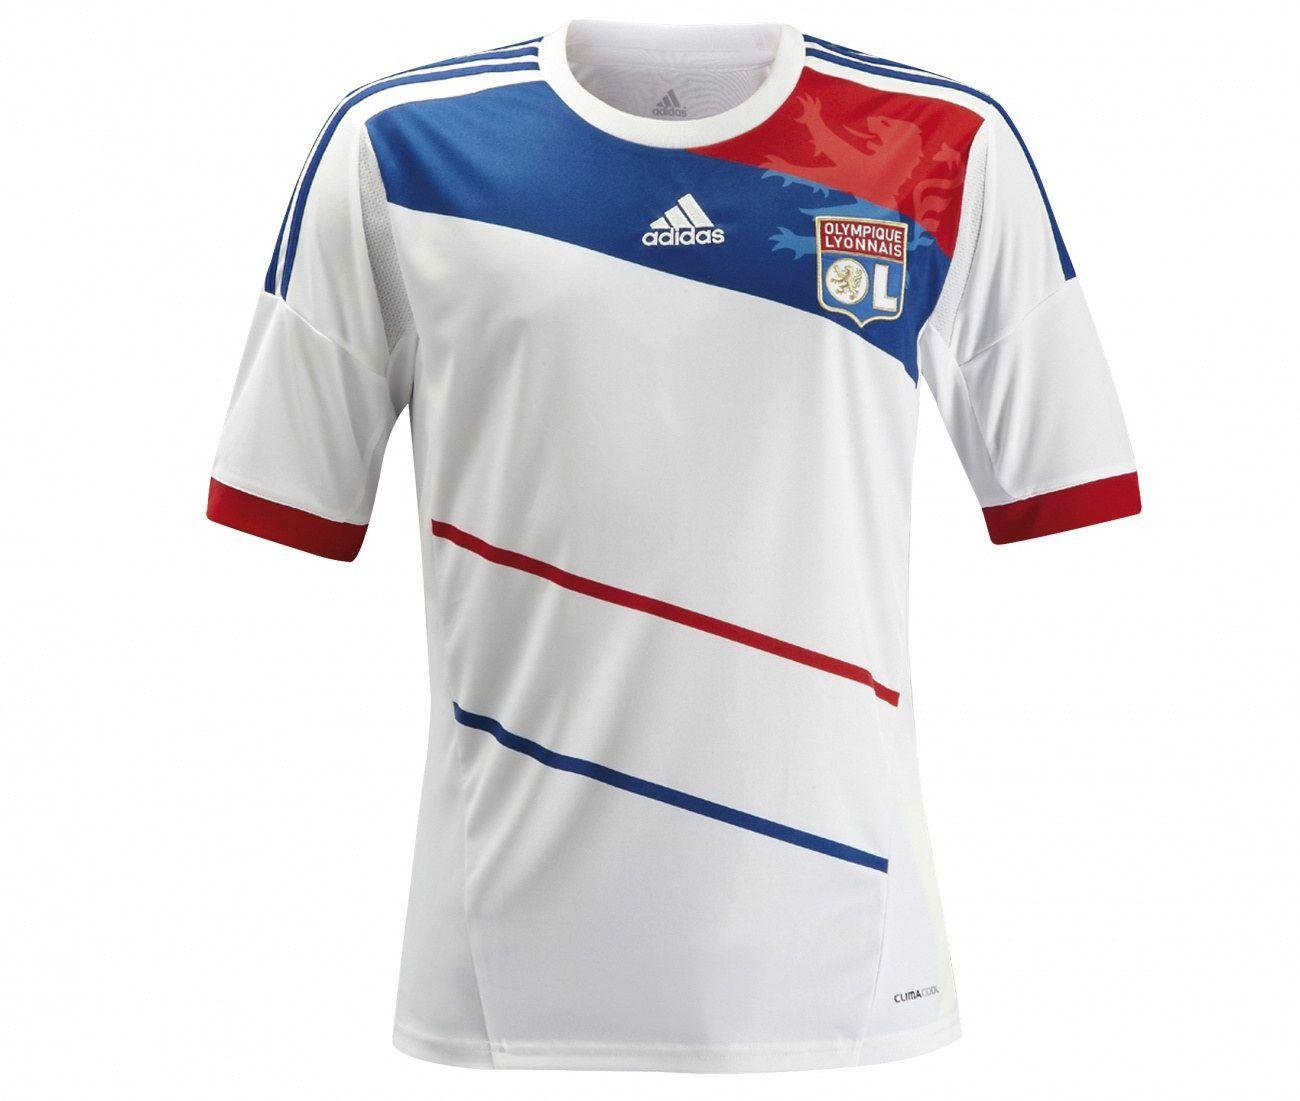 2f20b4b5d2dc5 Camiseta de fútbol de Lyon 2012 2013  189  - €16.87   Camisetas de futbol  baratas online!